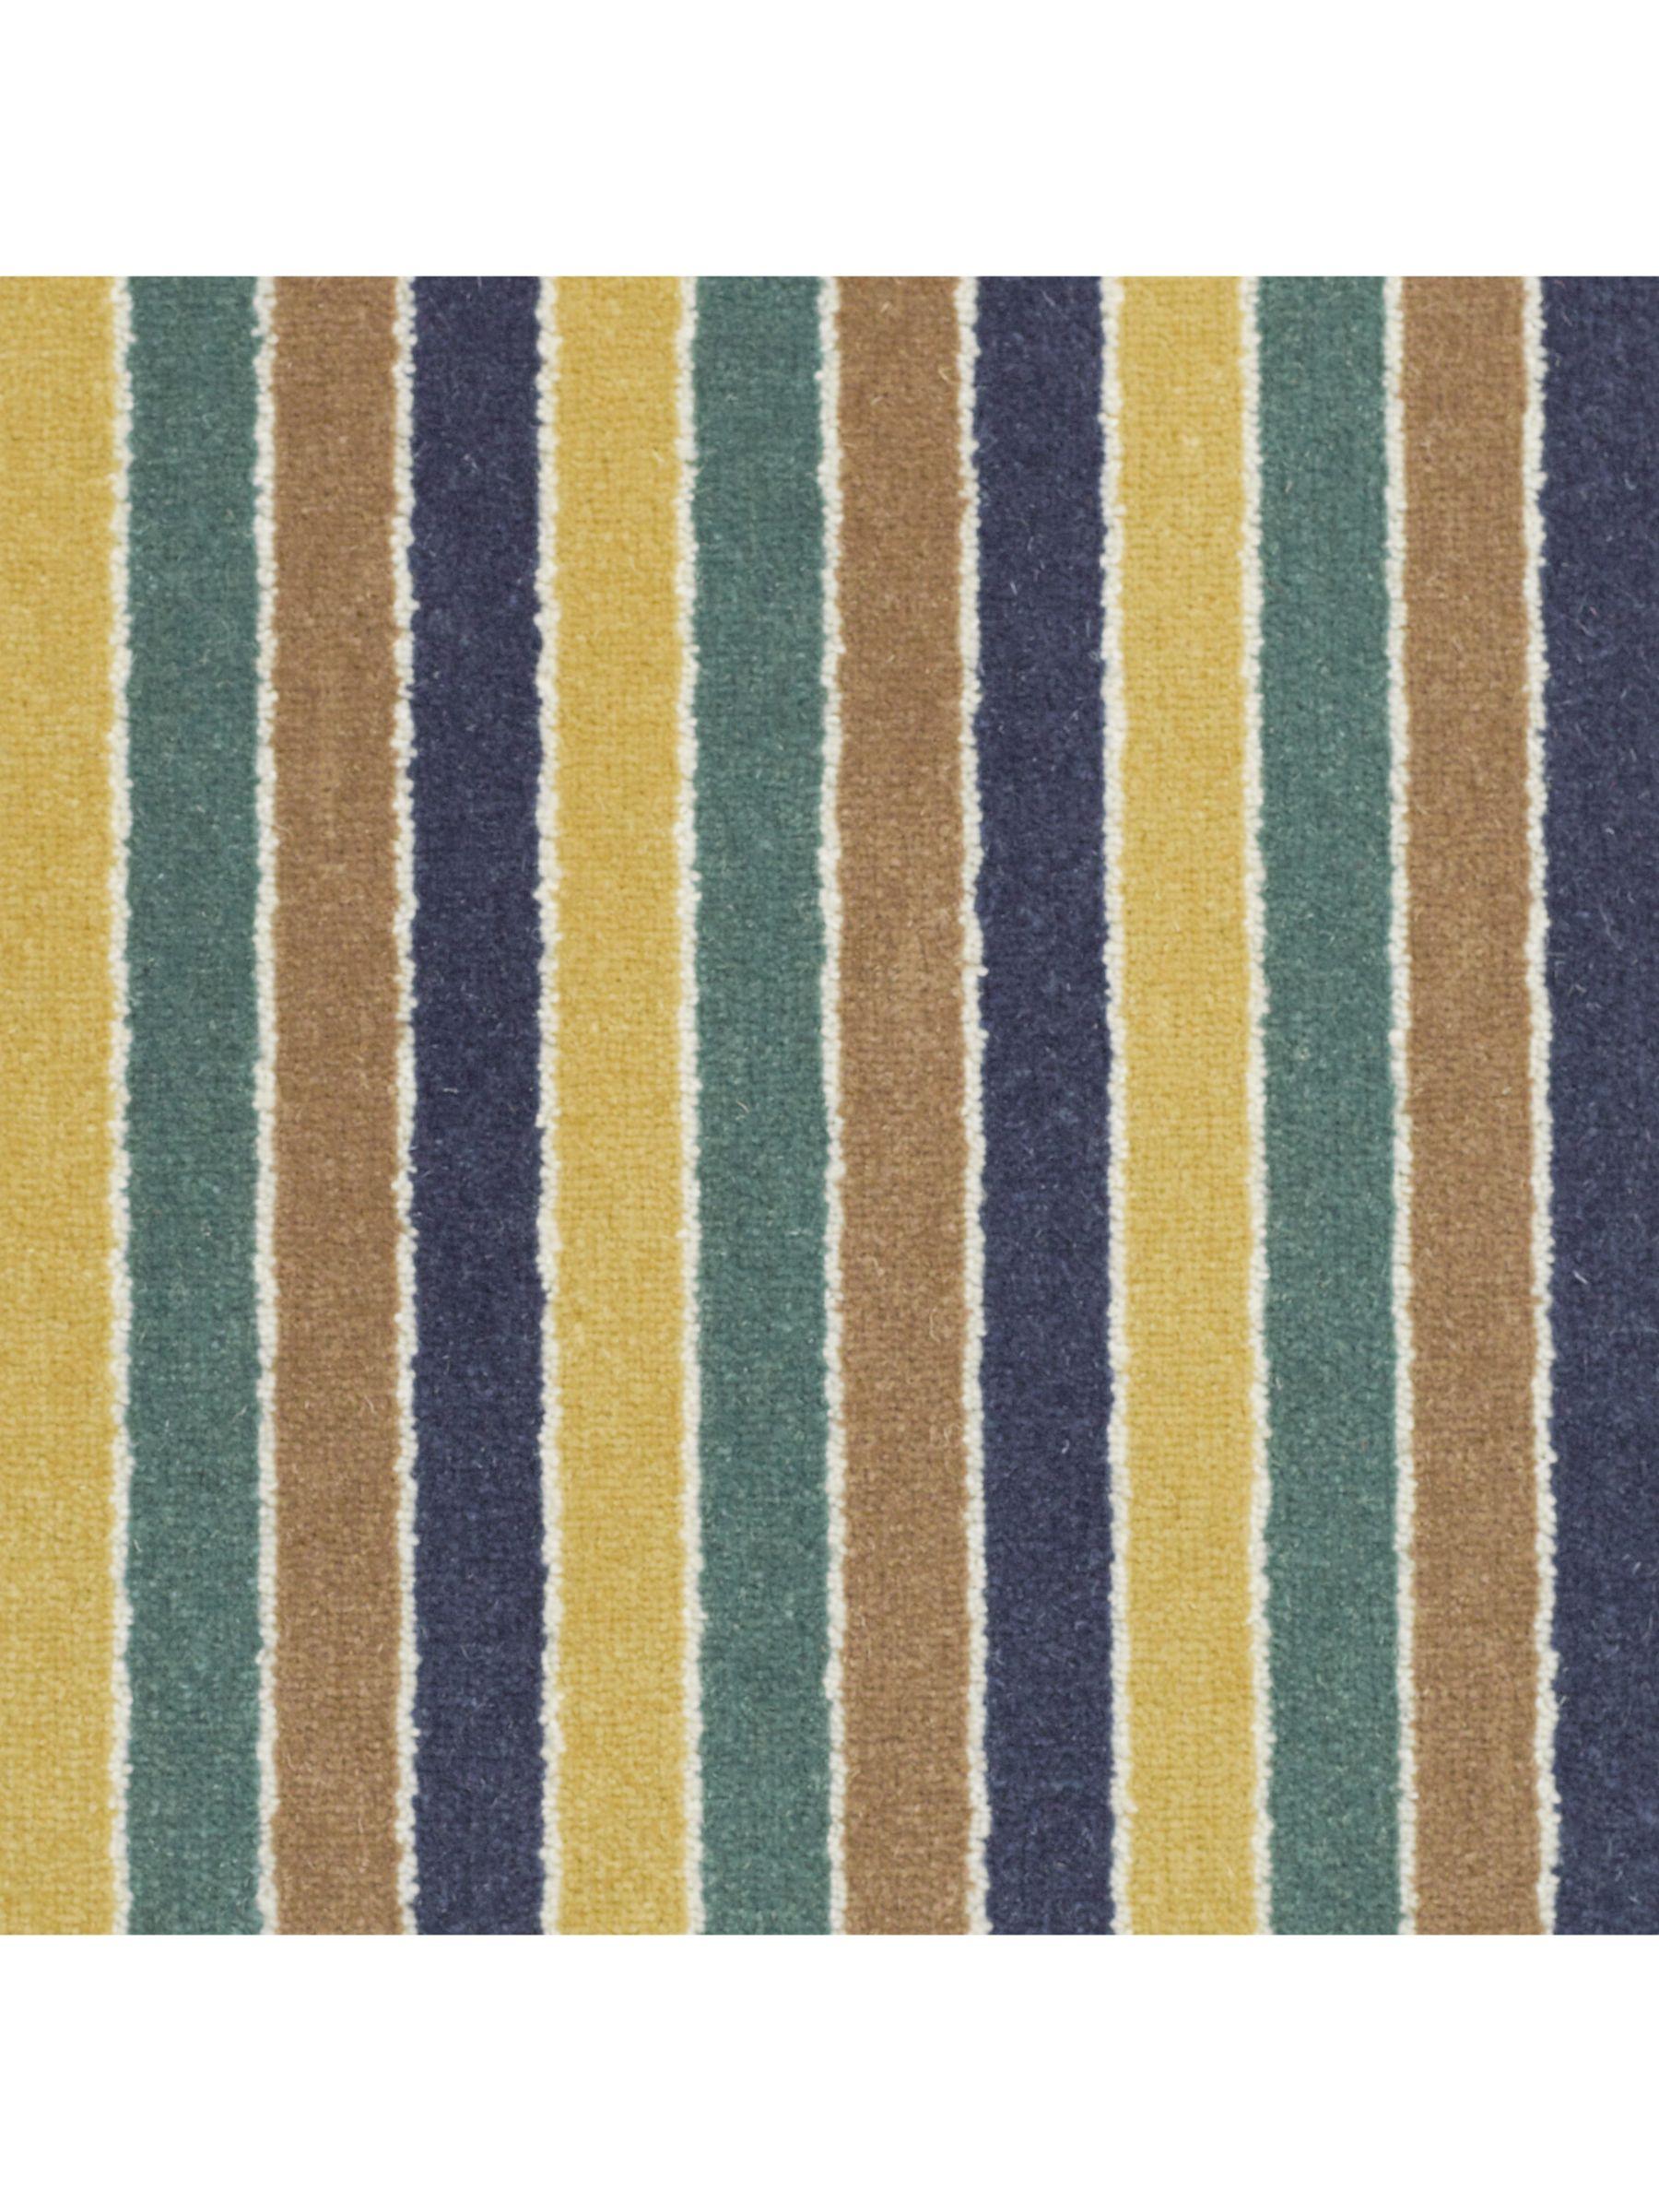 Adam Carpets Adam Carpets Deckchair Stripe Twist Carpet